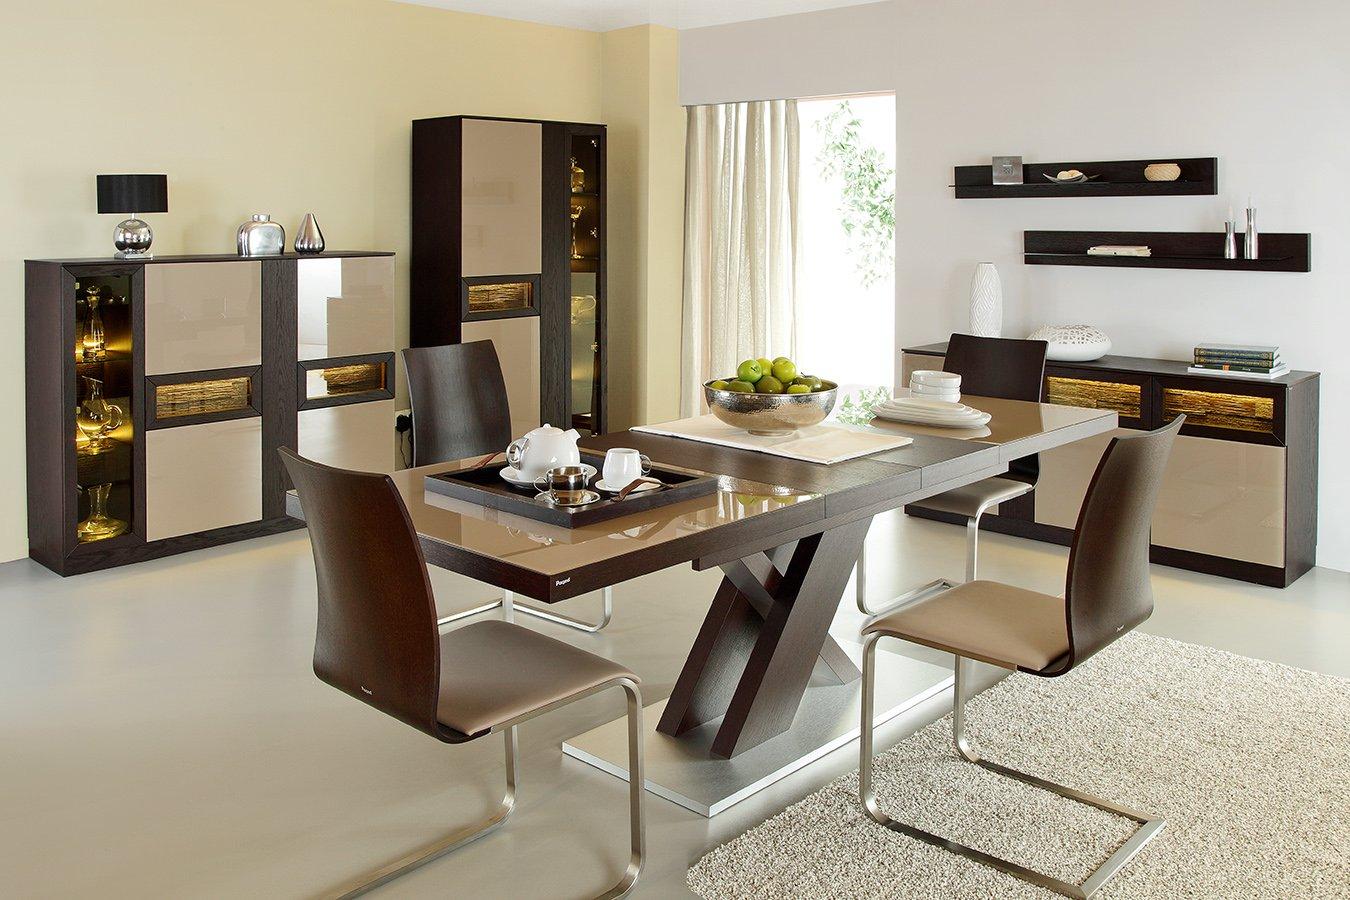 test3 Мебель для столовой New York (Paged Meble, Польша)